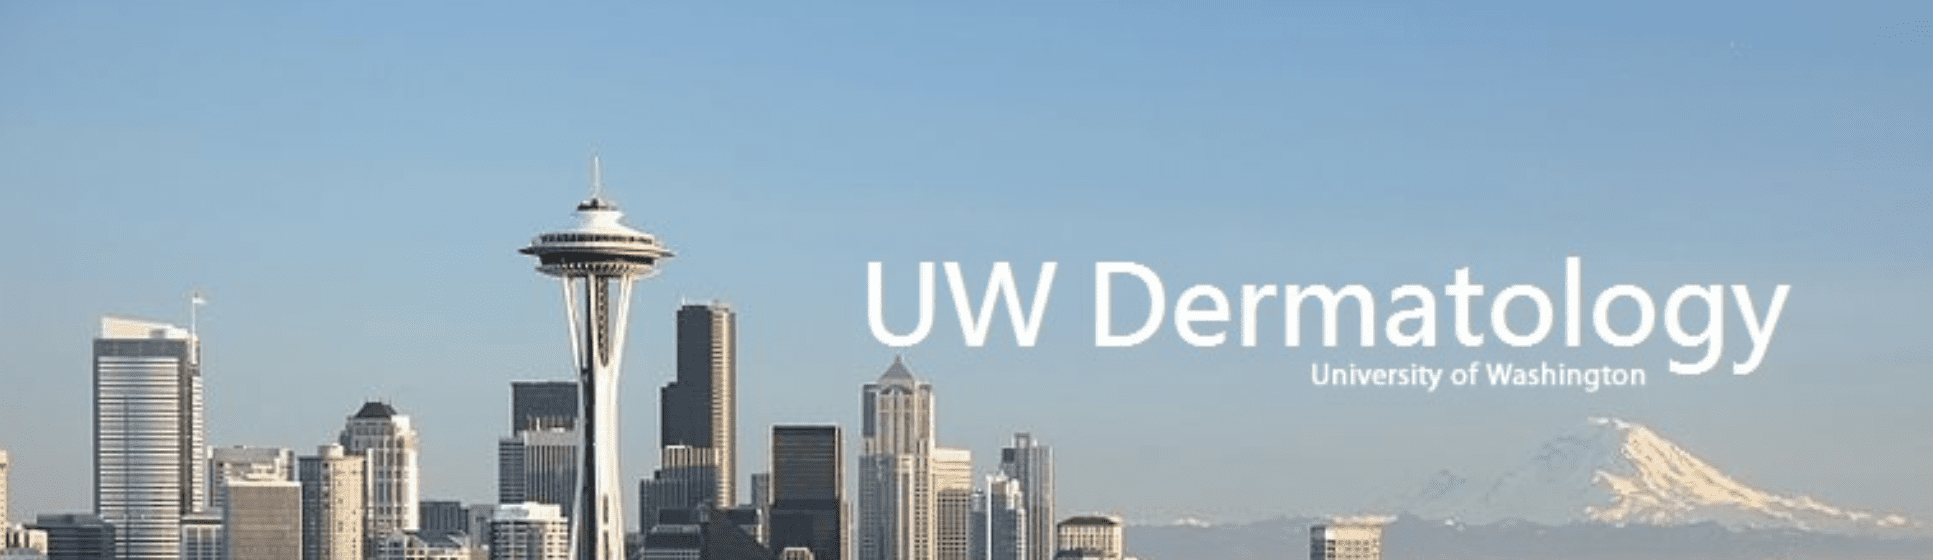 UW Dermatology Grand Rounds